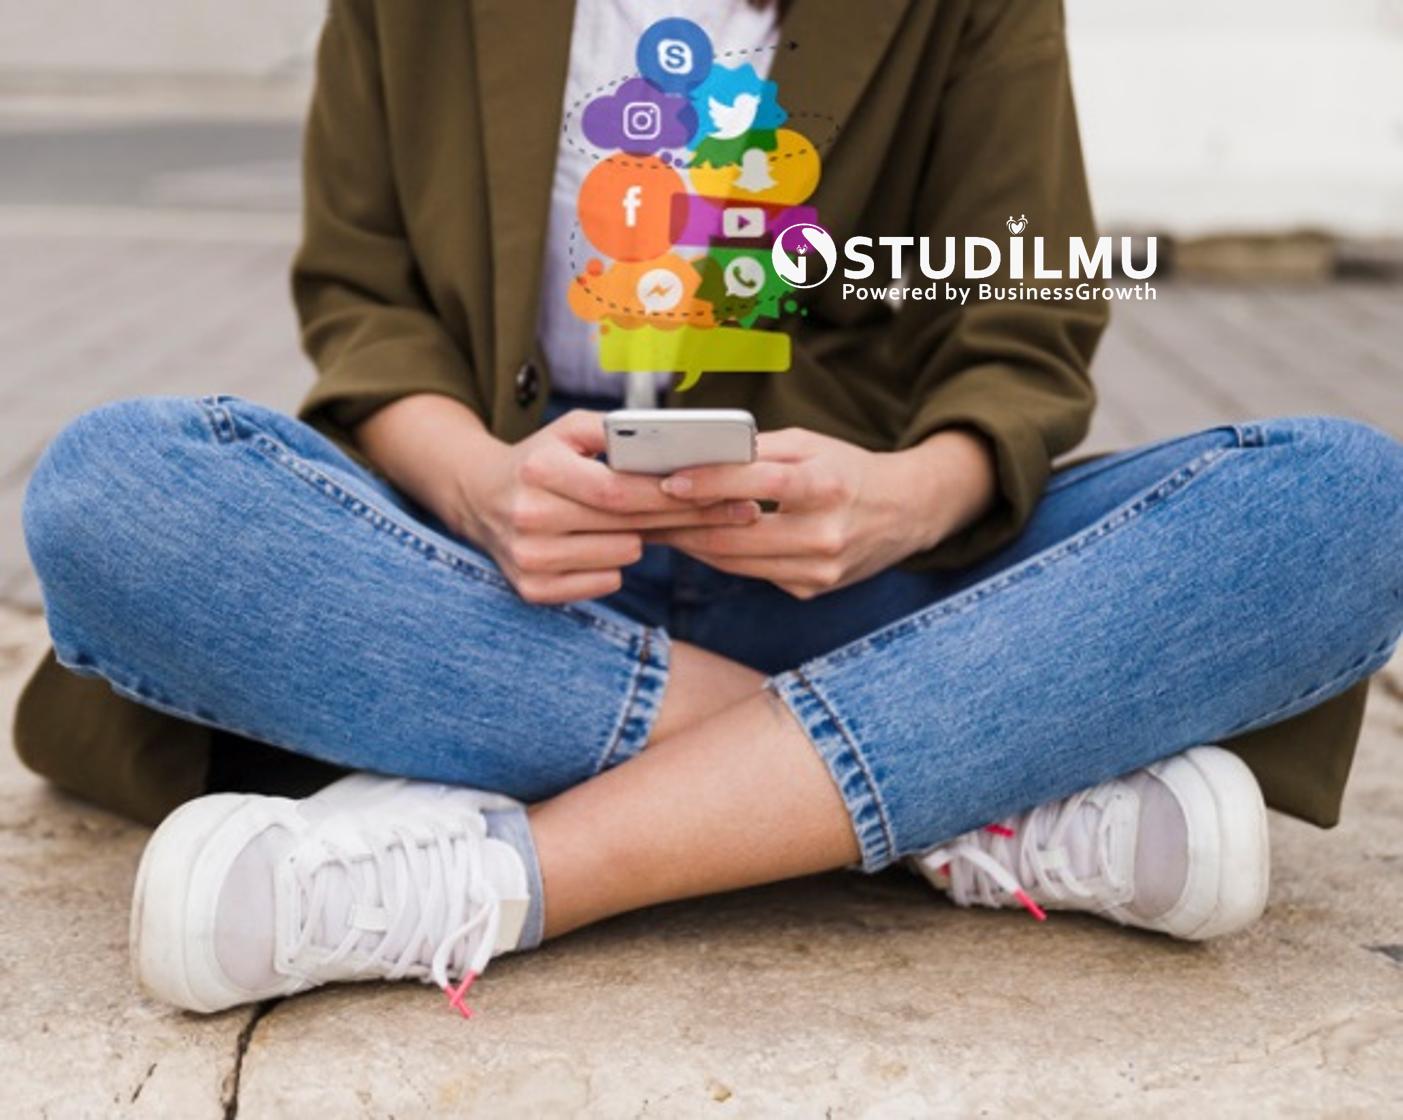 STUDILMU Career Advice - 10 Hukum Pemasaran Media Sosial